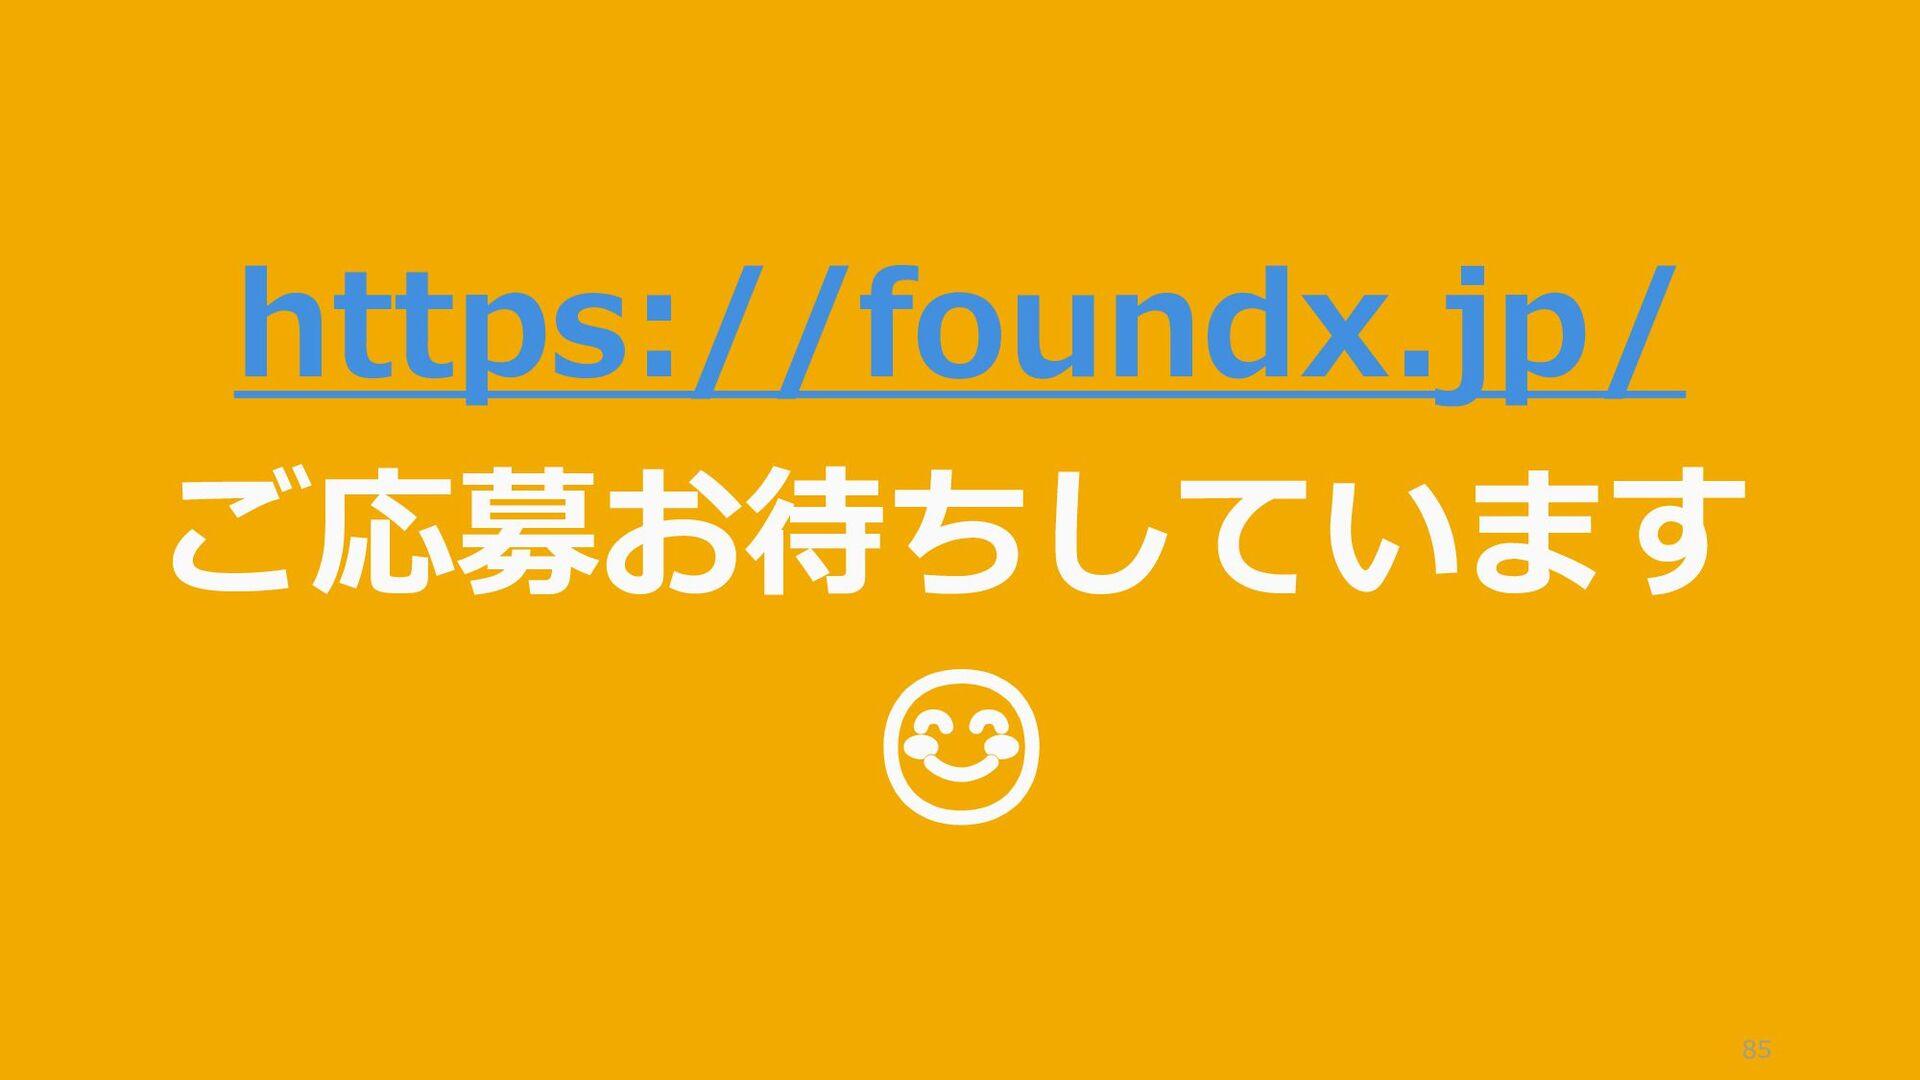 84 https://foundx.jp/ ご応募お待ちしています 😊